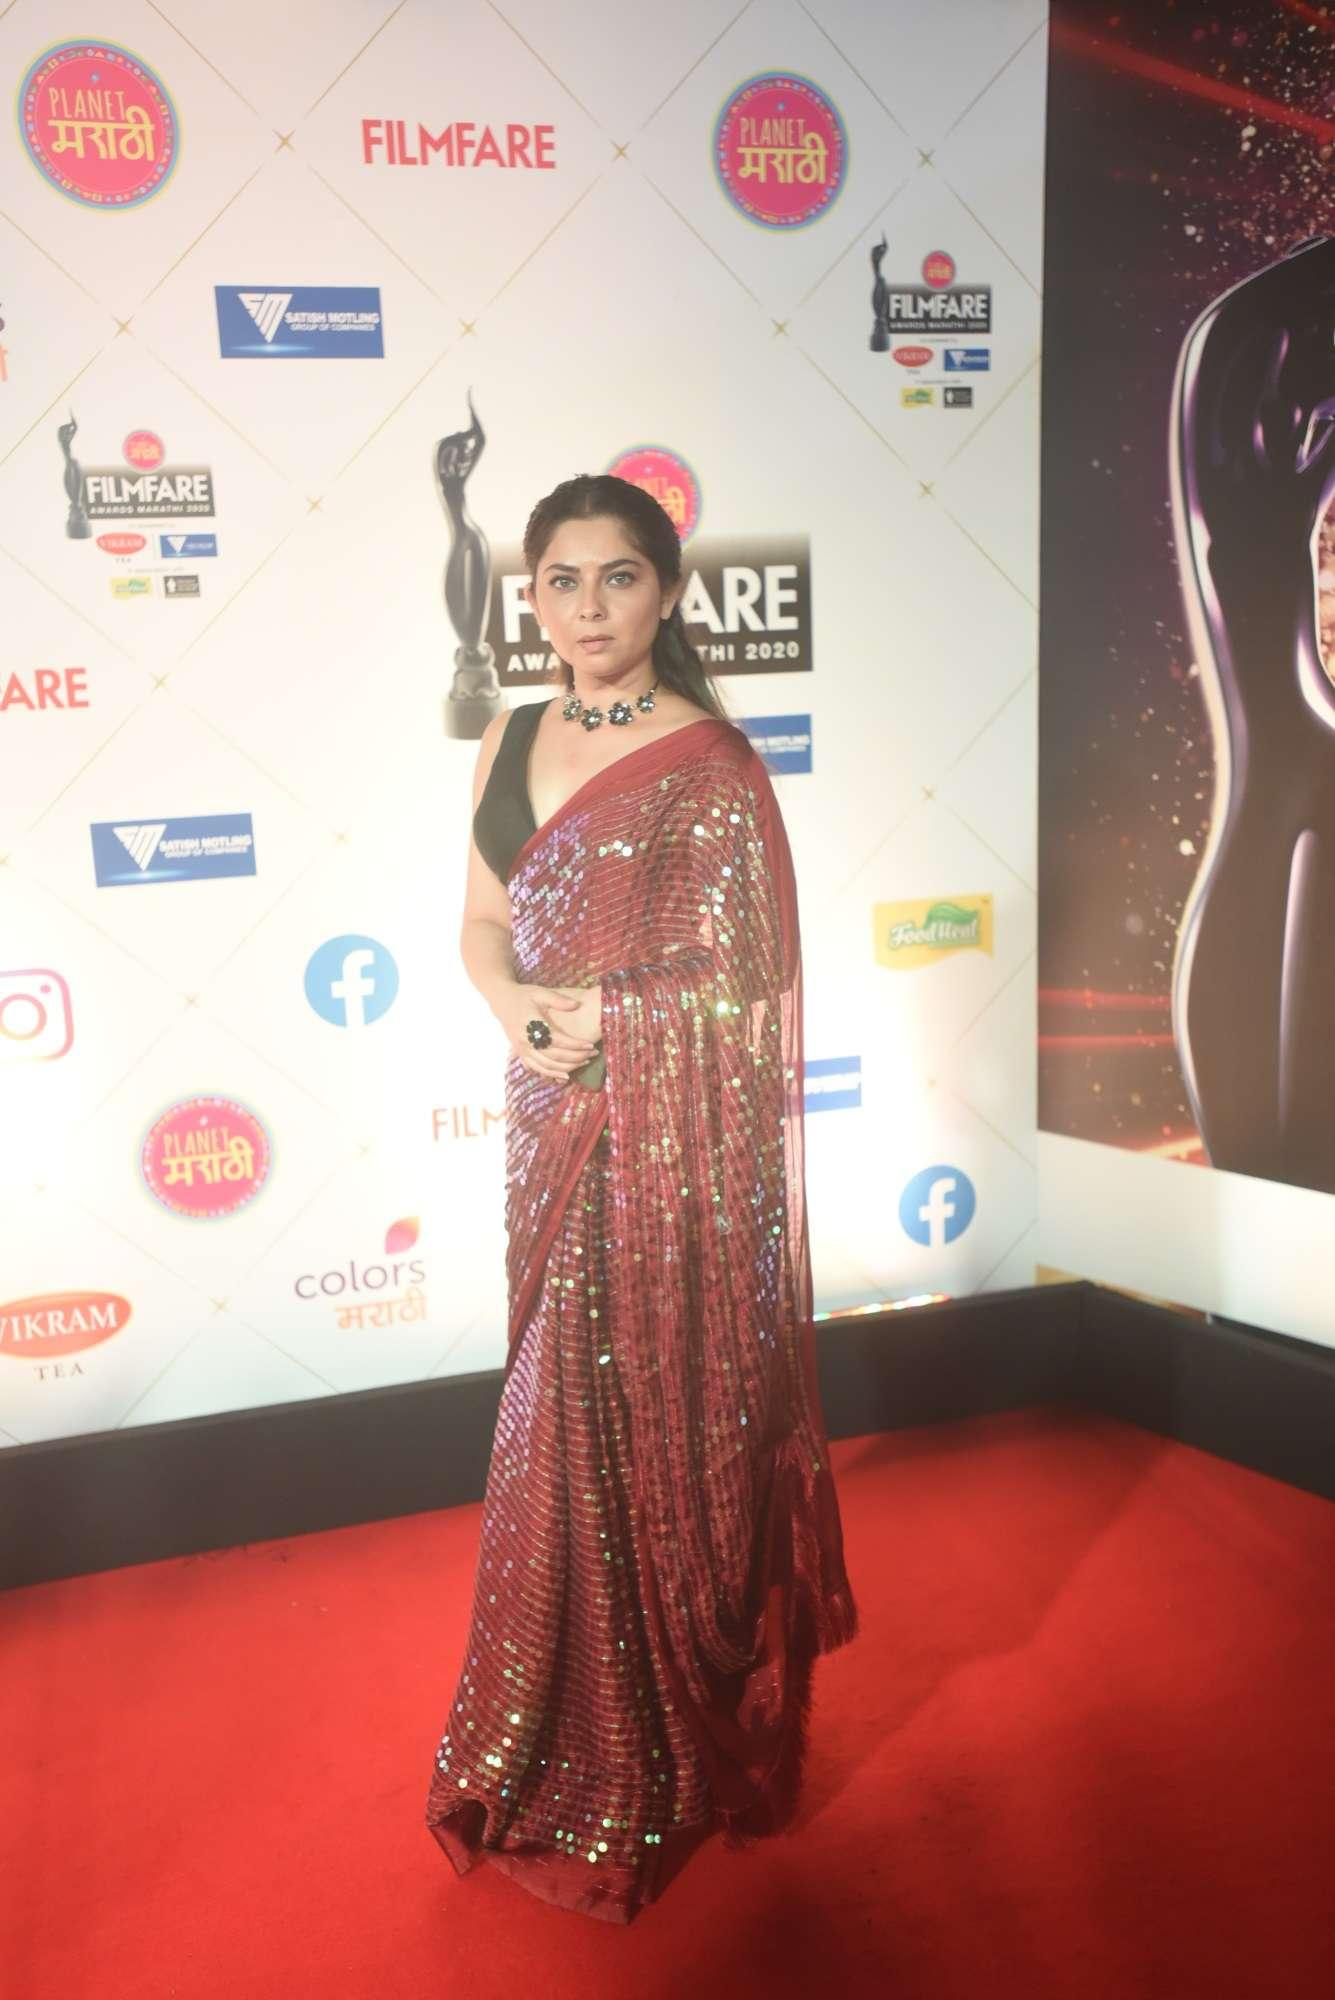 Planet Marathi Filmfare Awards 2020: Amruta Khanvilkar, Pooja Sawant, Sonali Kulkarni and others make heads turn at the red carpet | Marathi Movie News - Times of India